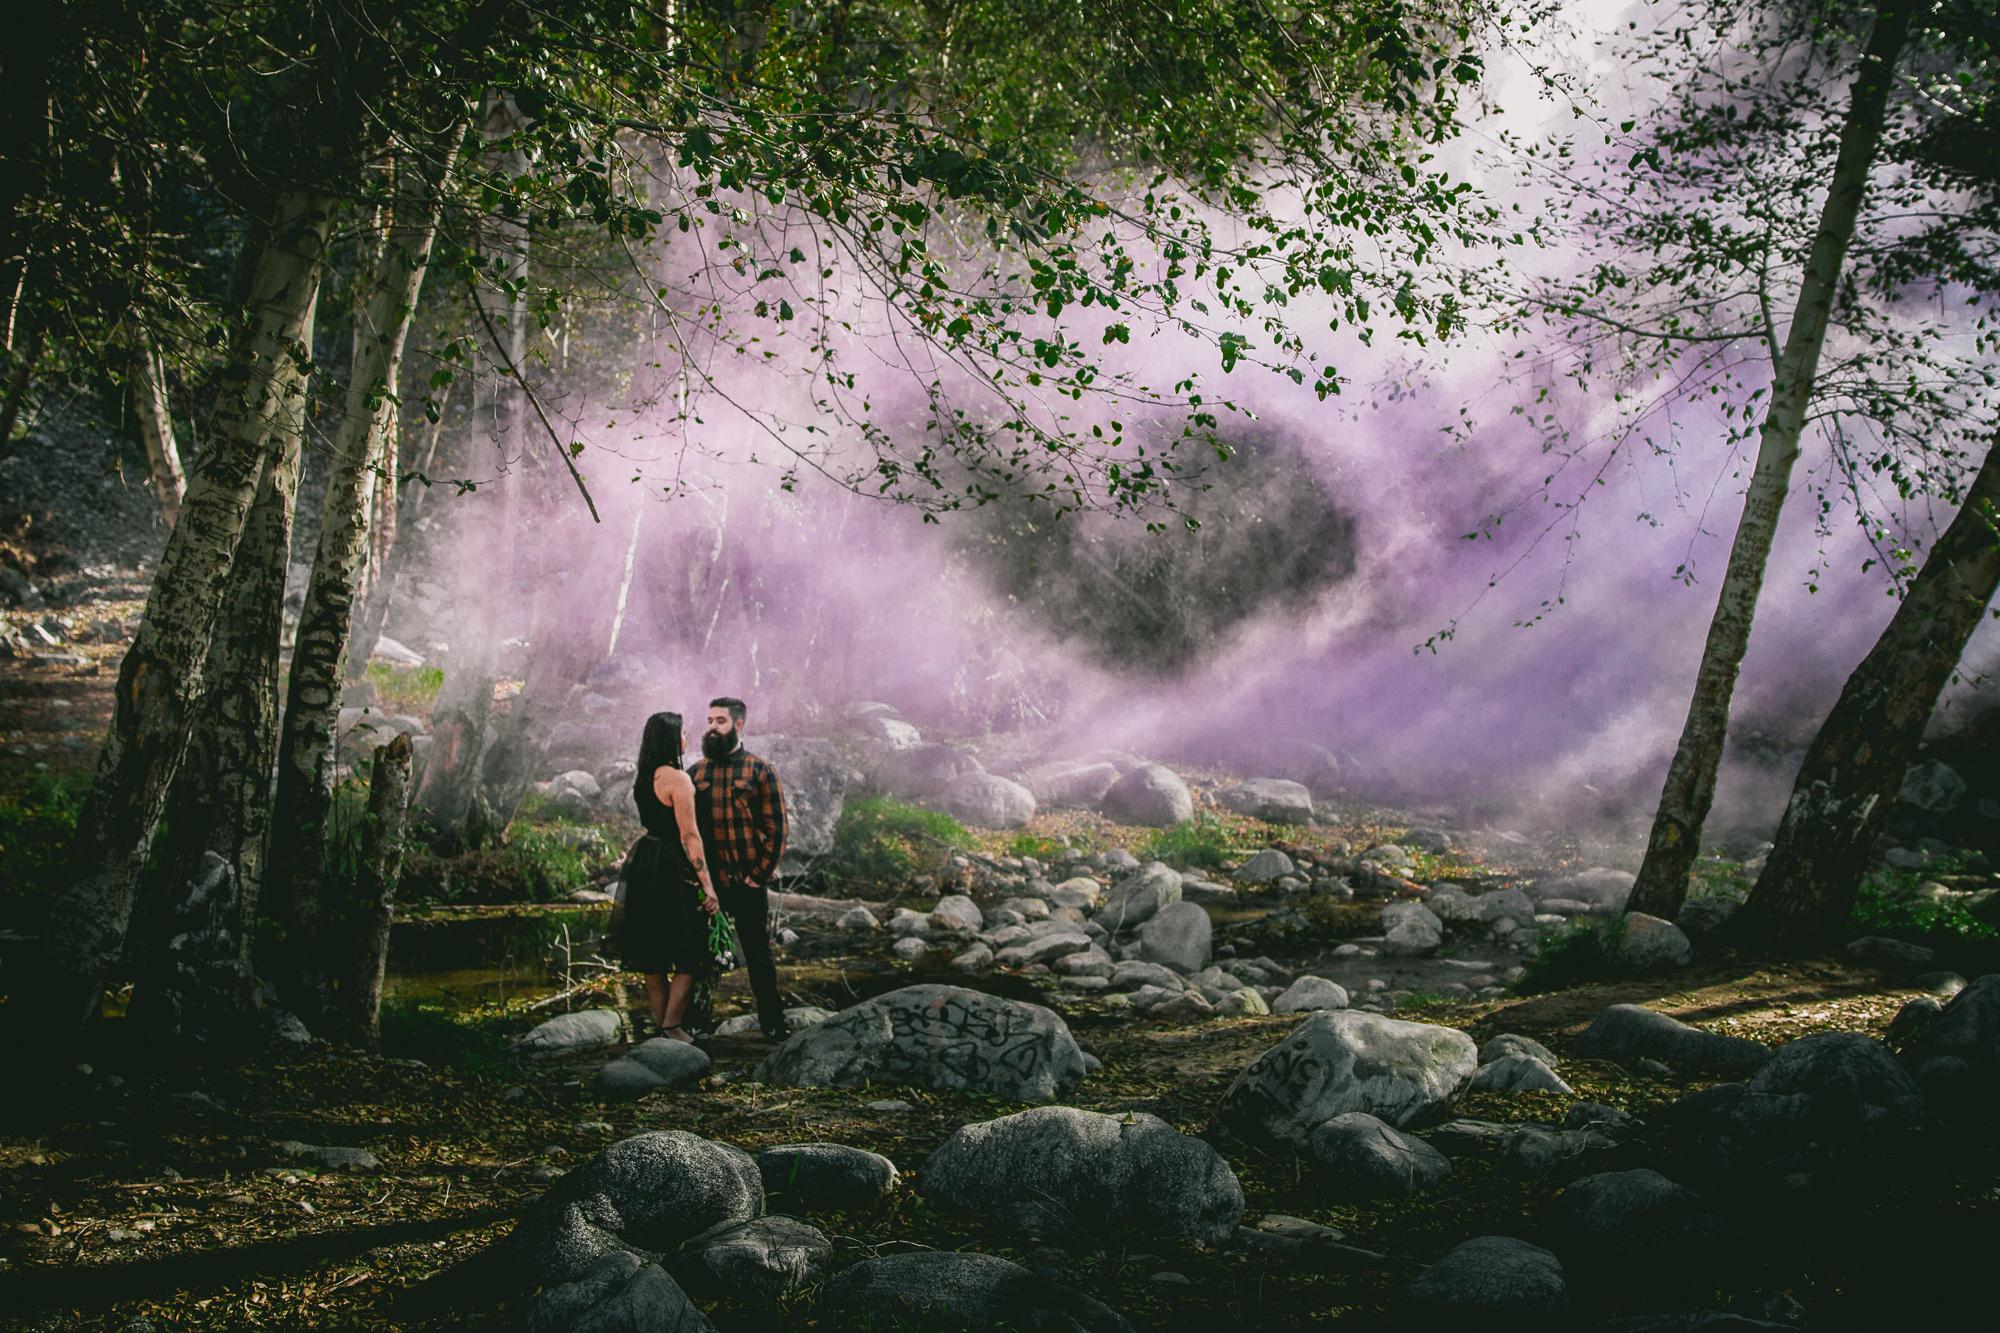 IMG_1611_Melissa-Phelan-Photographer-Wedding-Engagement-Elopement-Adventure-Love-Explore-Documenting.jpg